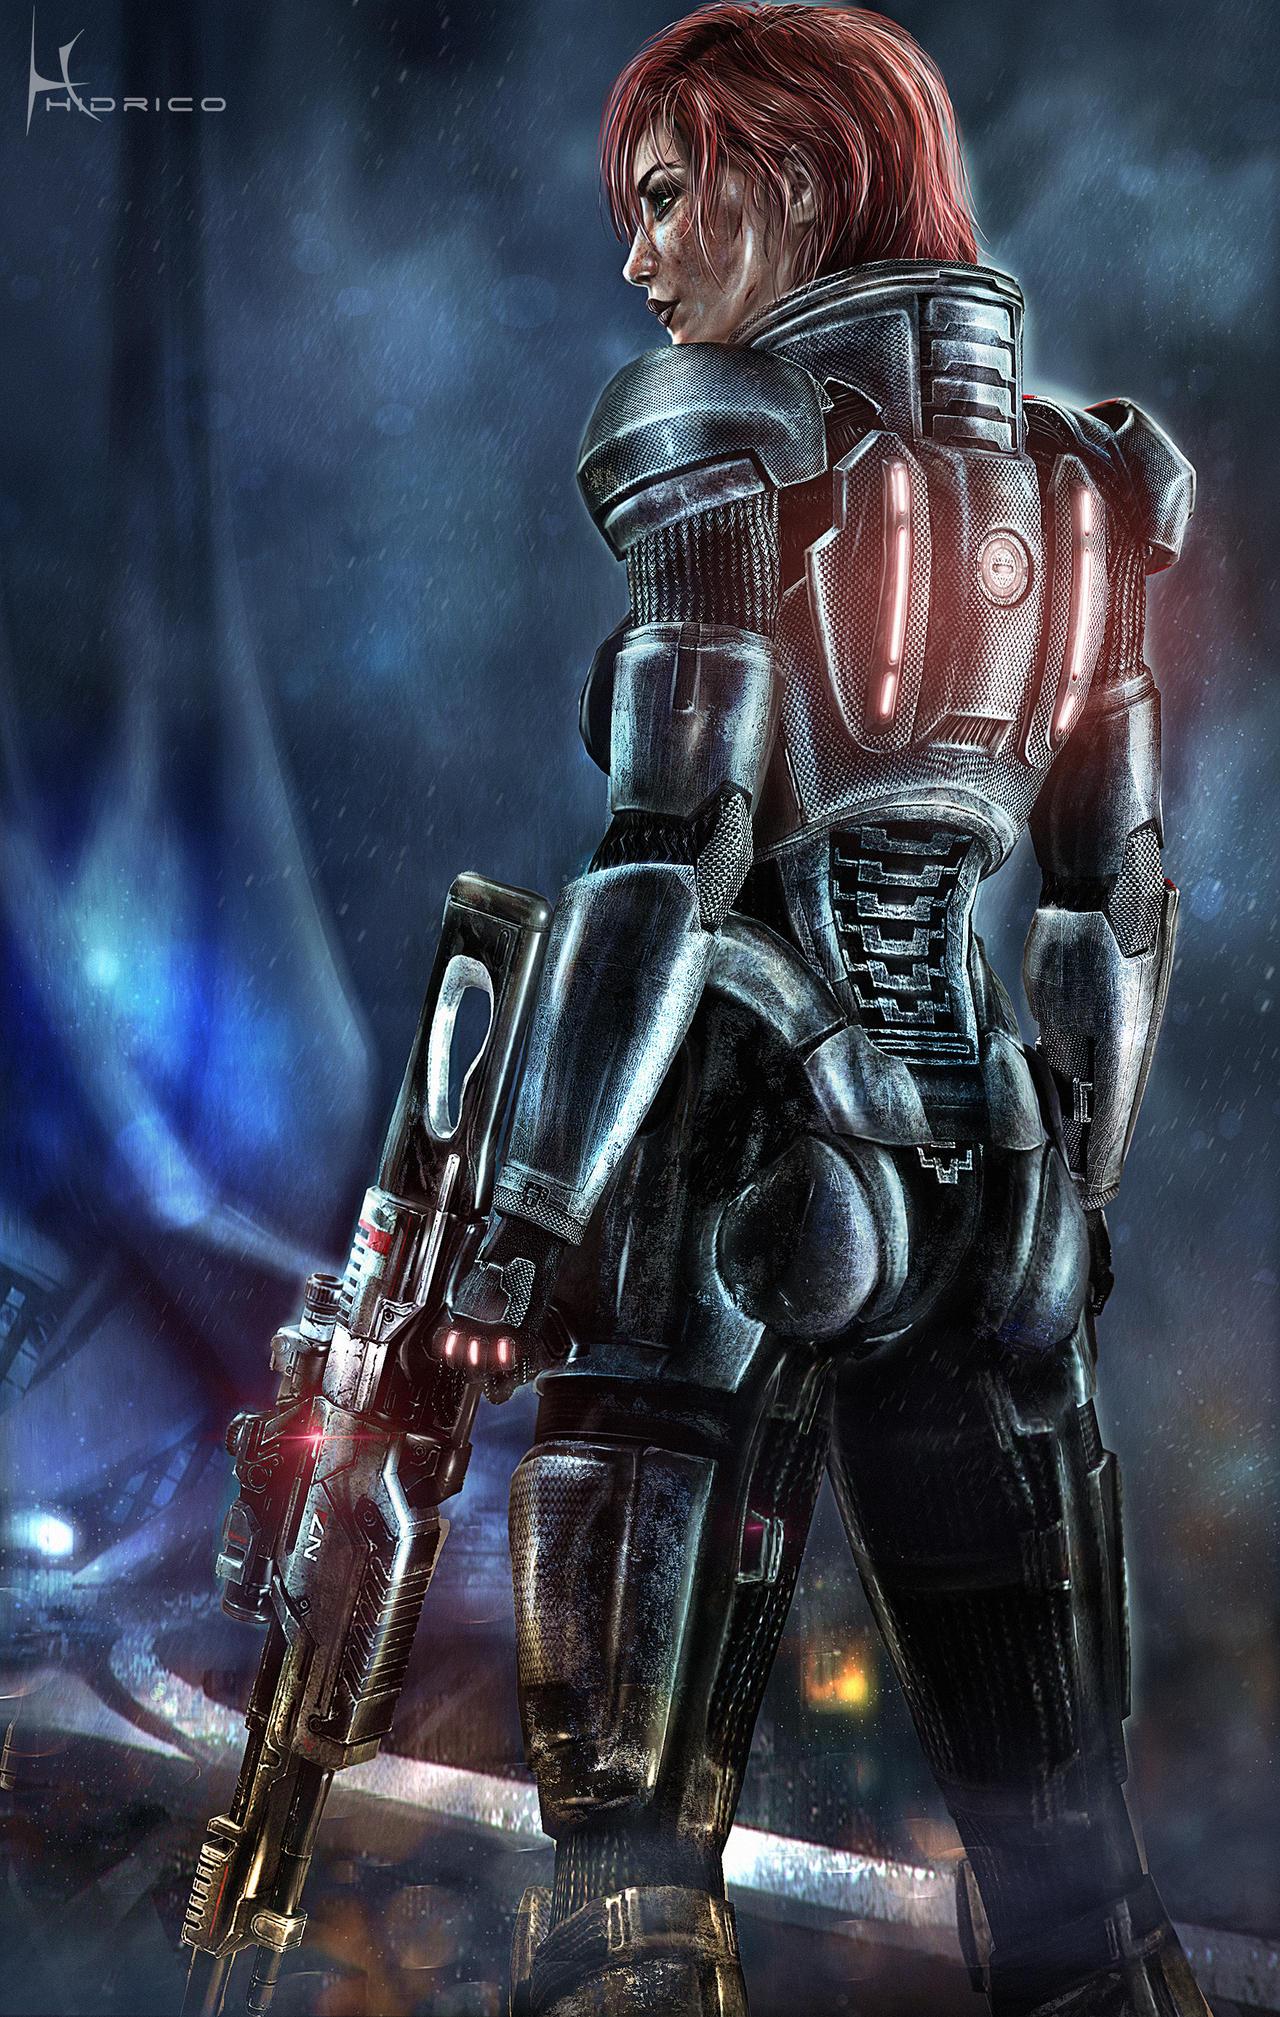 FemShepard - Mass Effect 3 by Hidrico